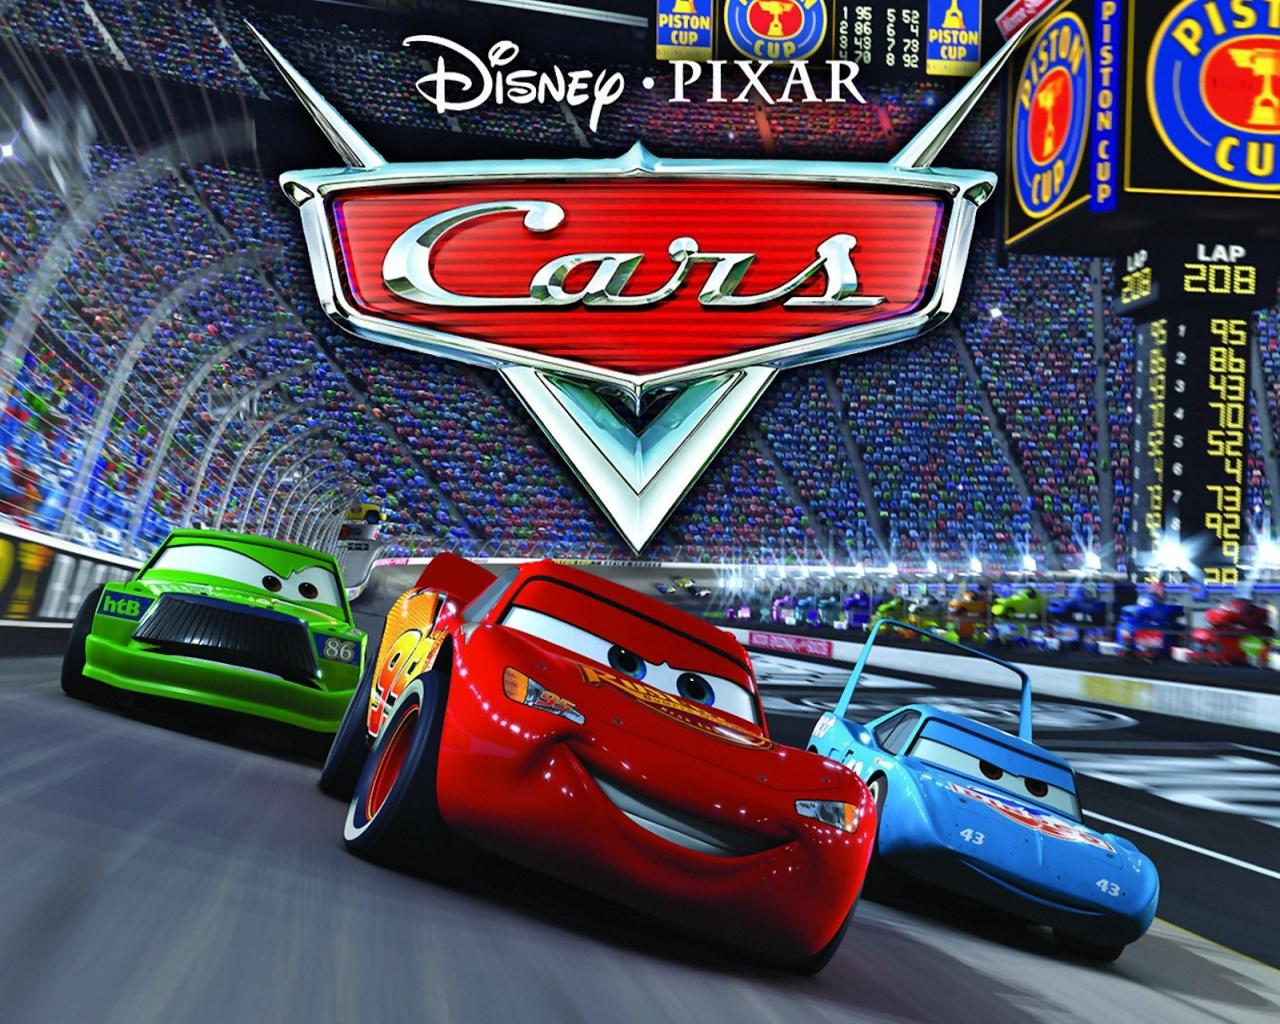 disney pixar cars wallpaper 1280x1024jpg 1280x1024